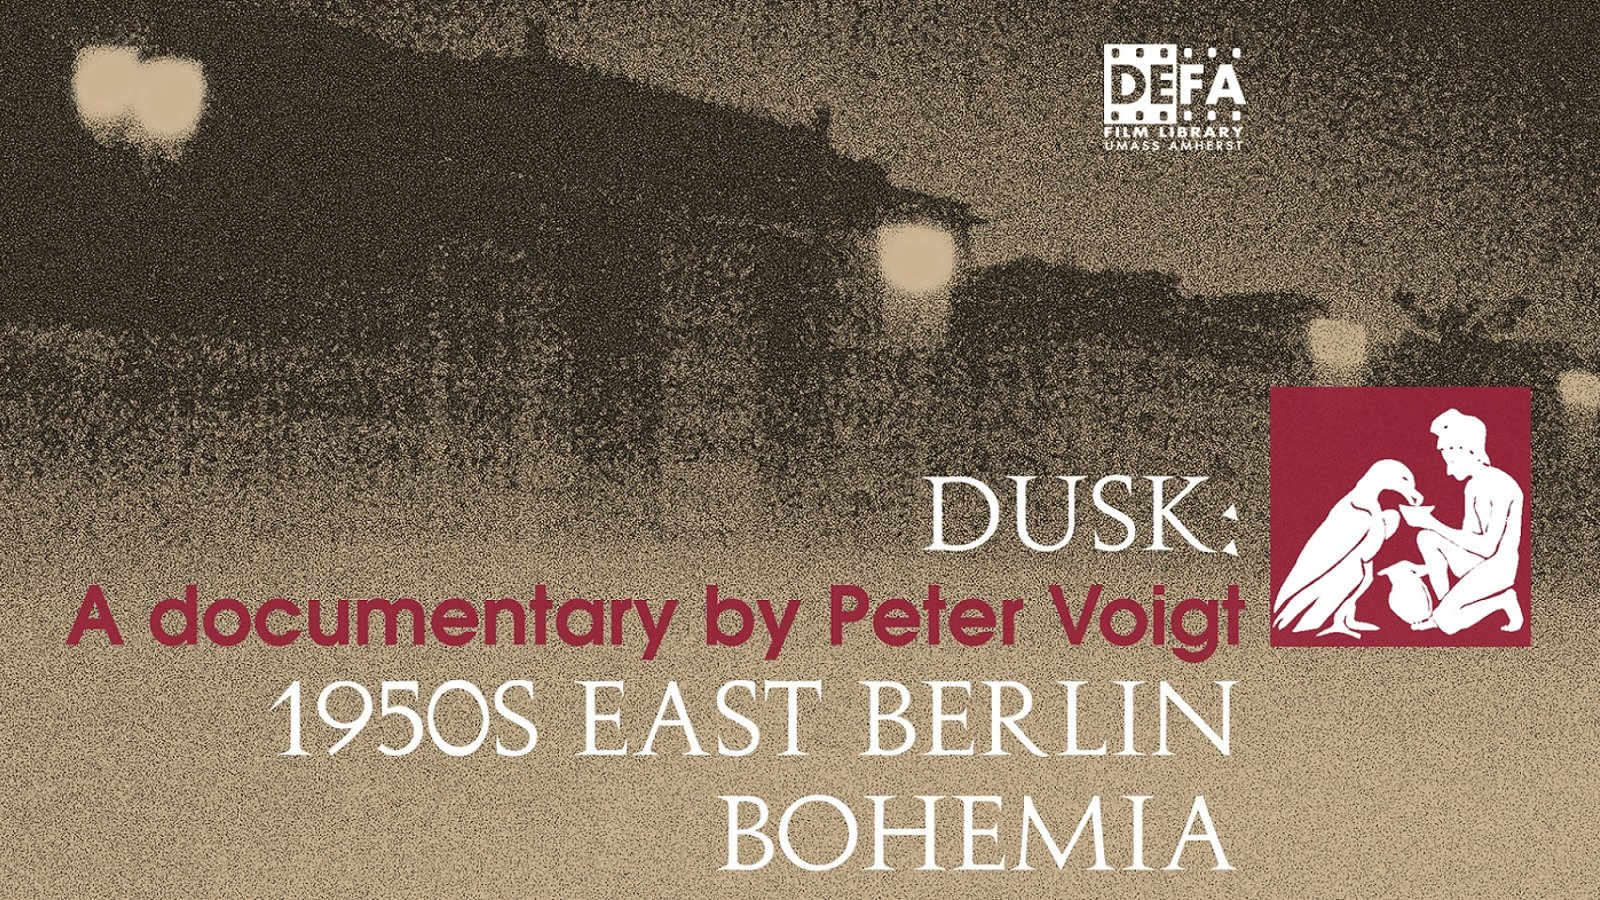 Dusk - 1950s East Berlin Bohemia